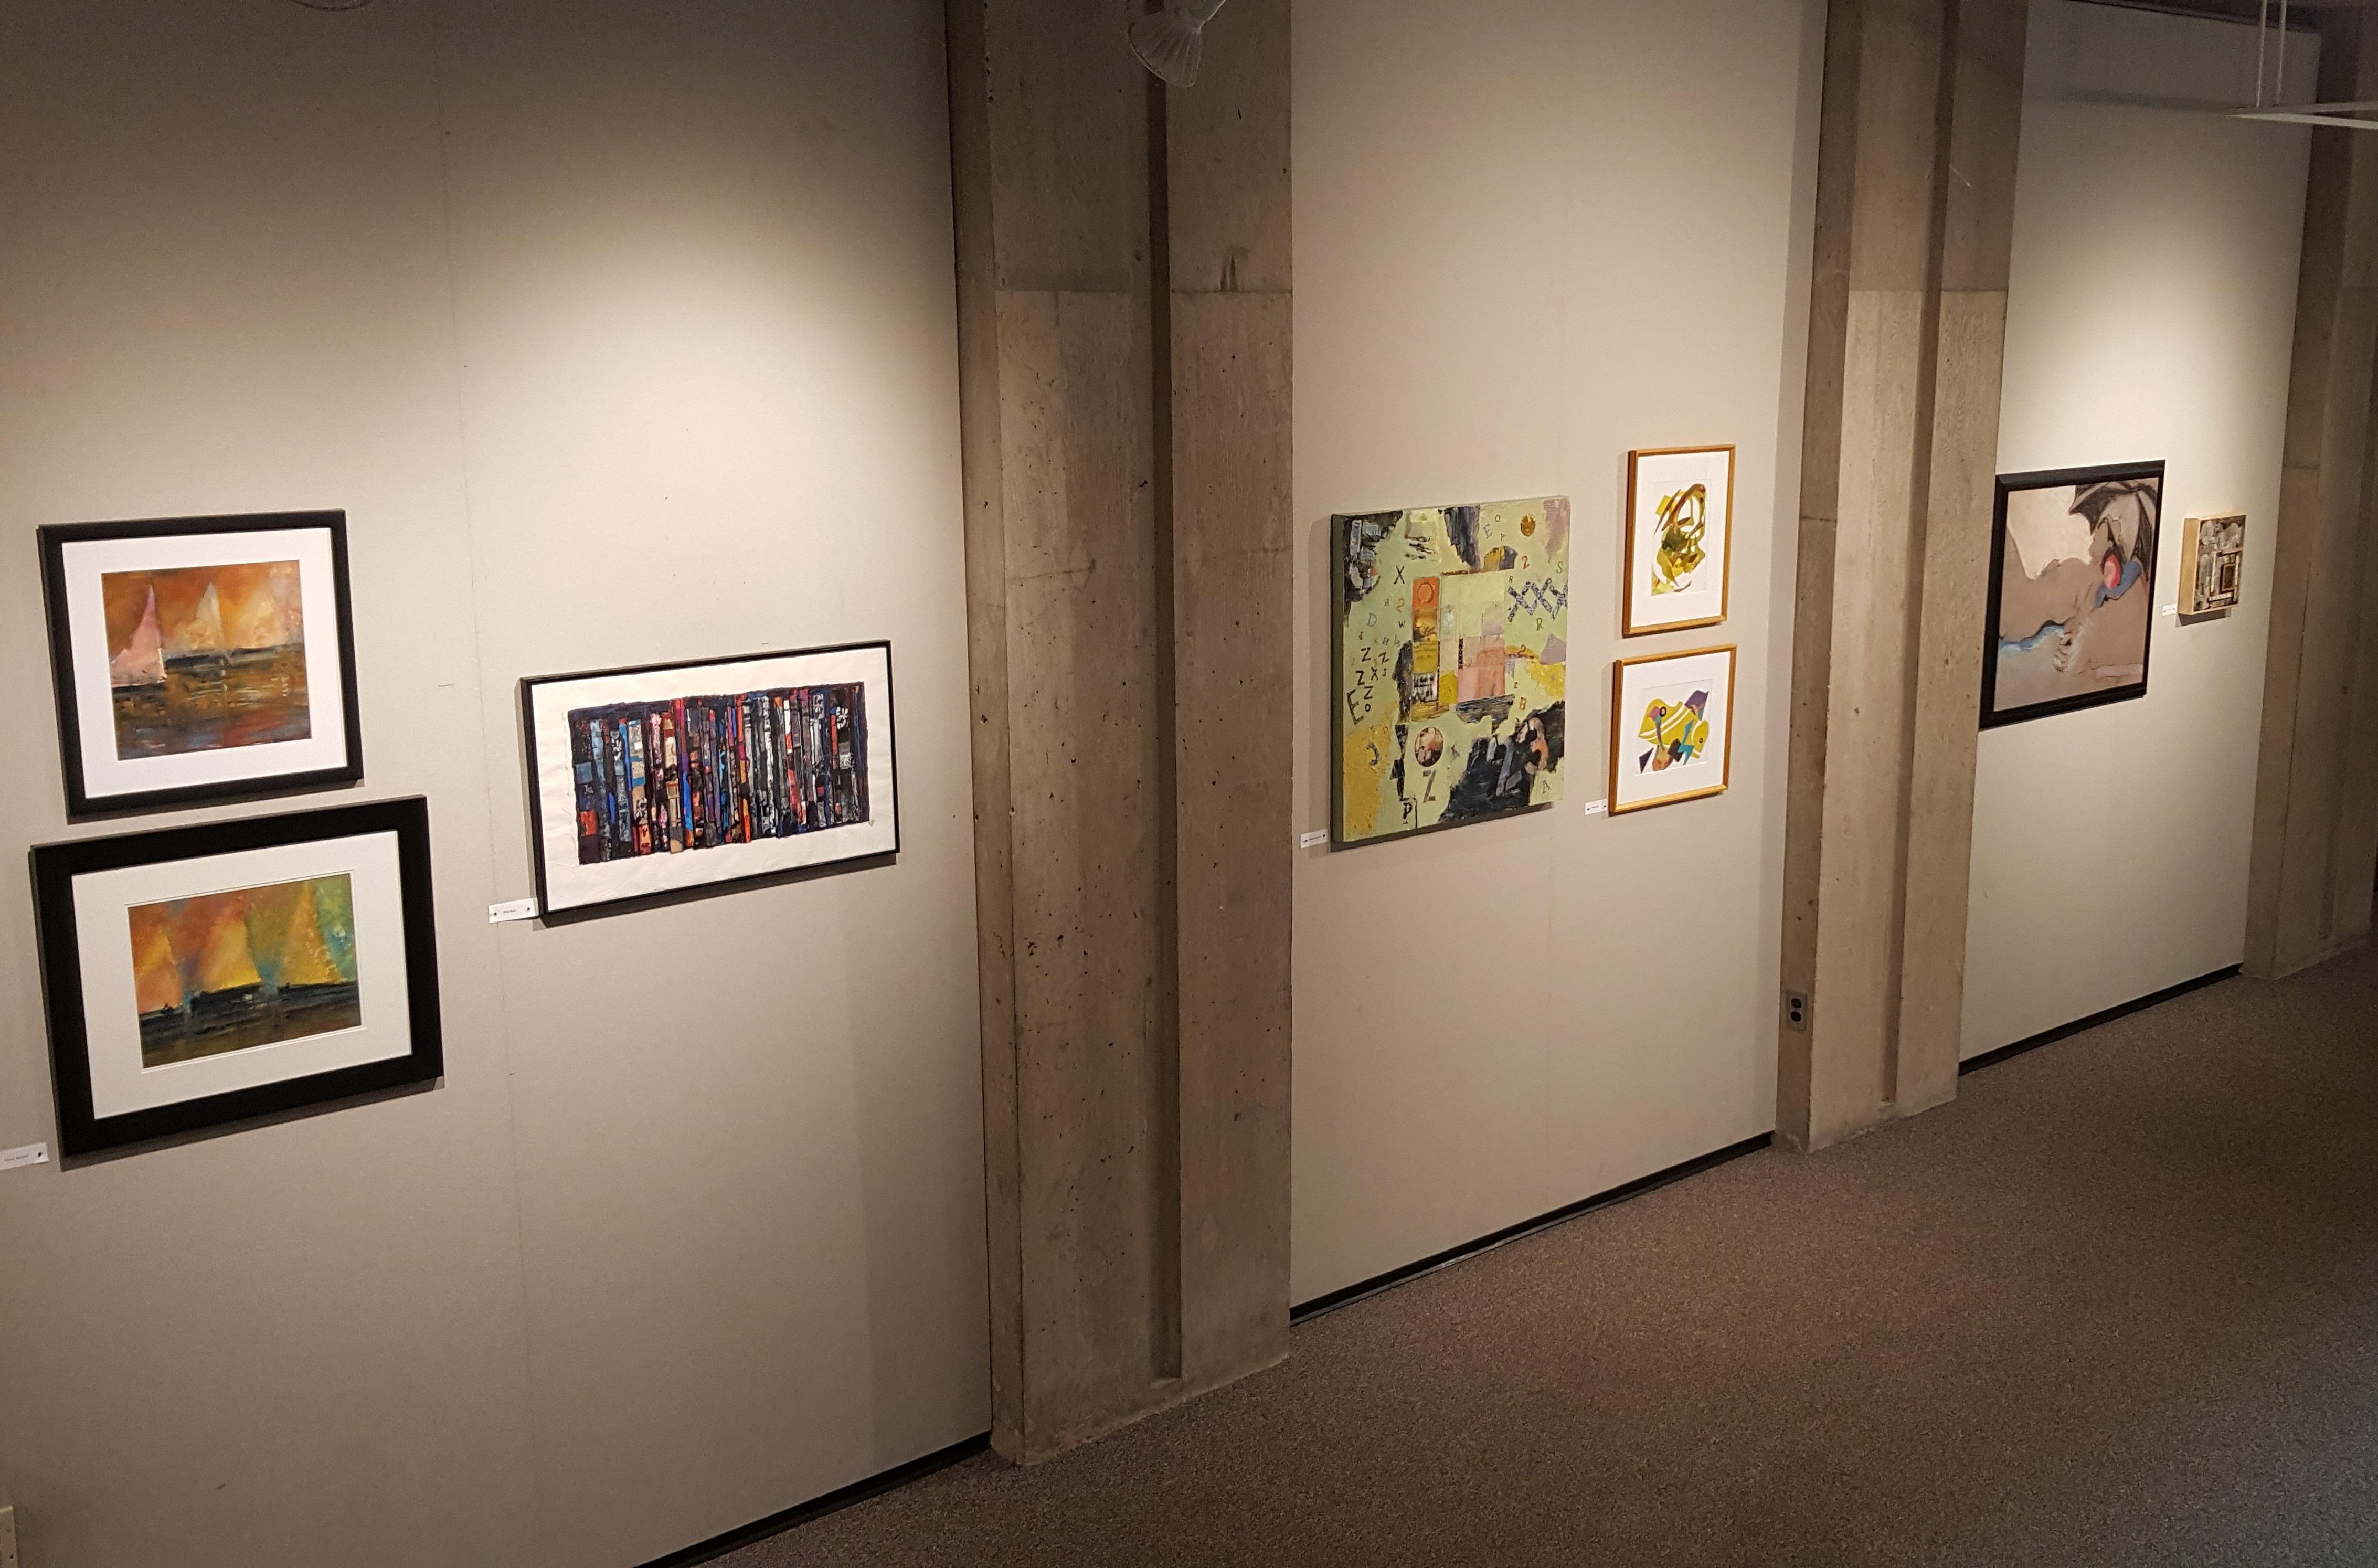 Downtown La Art Galleries